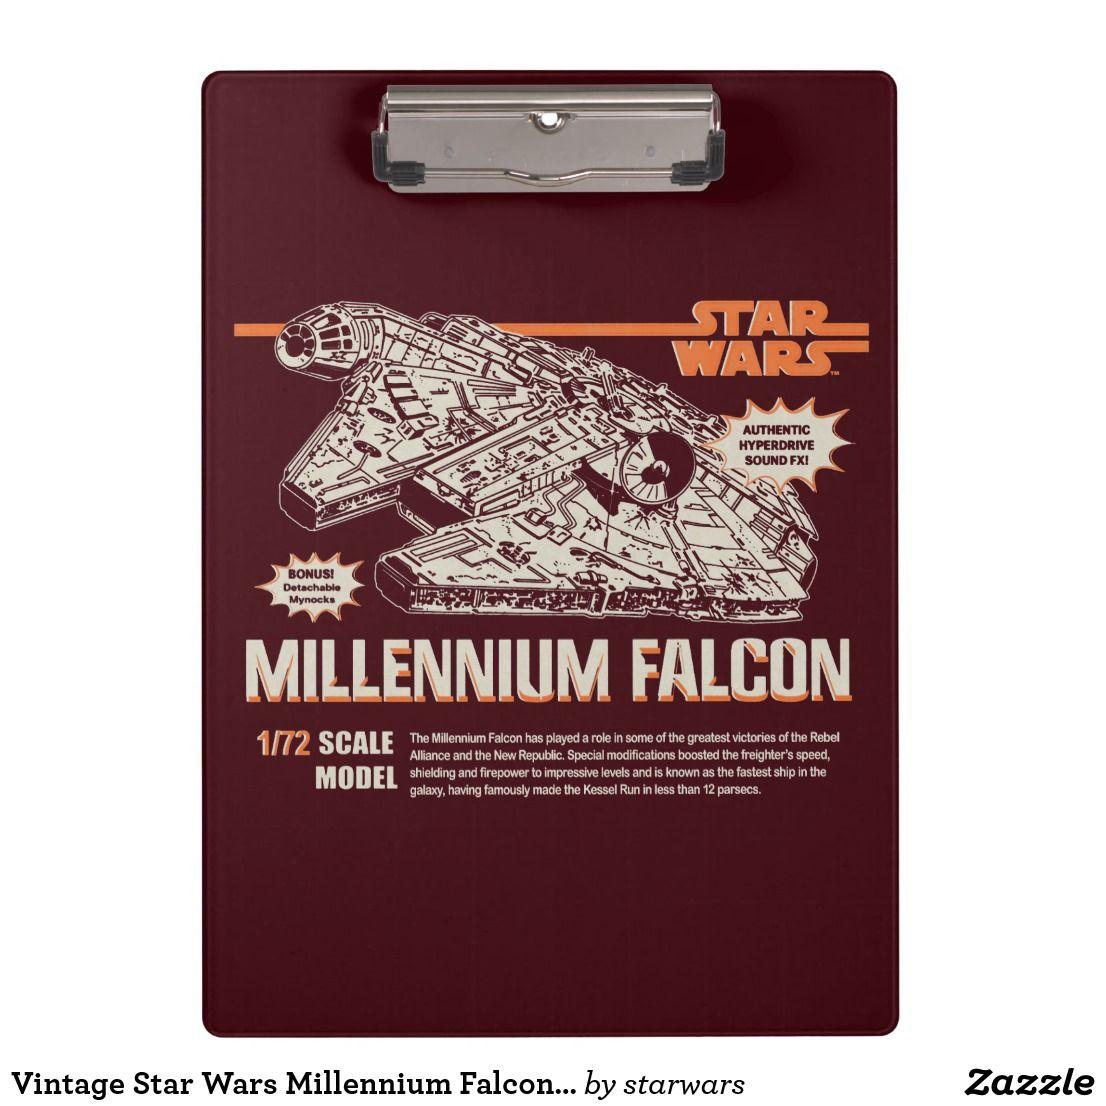 Vintage Star Wars Millennium Falcon Model Box Art